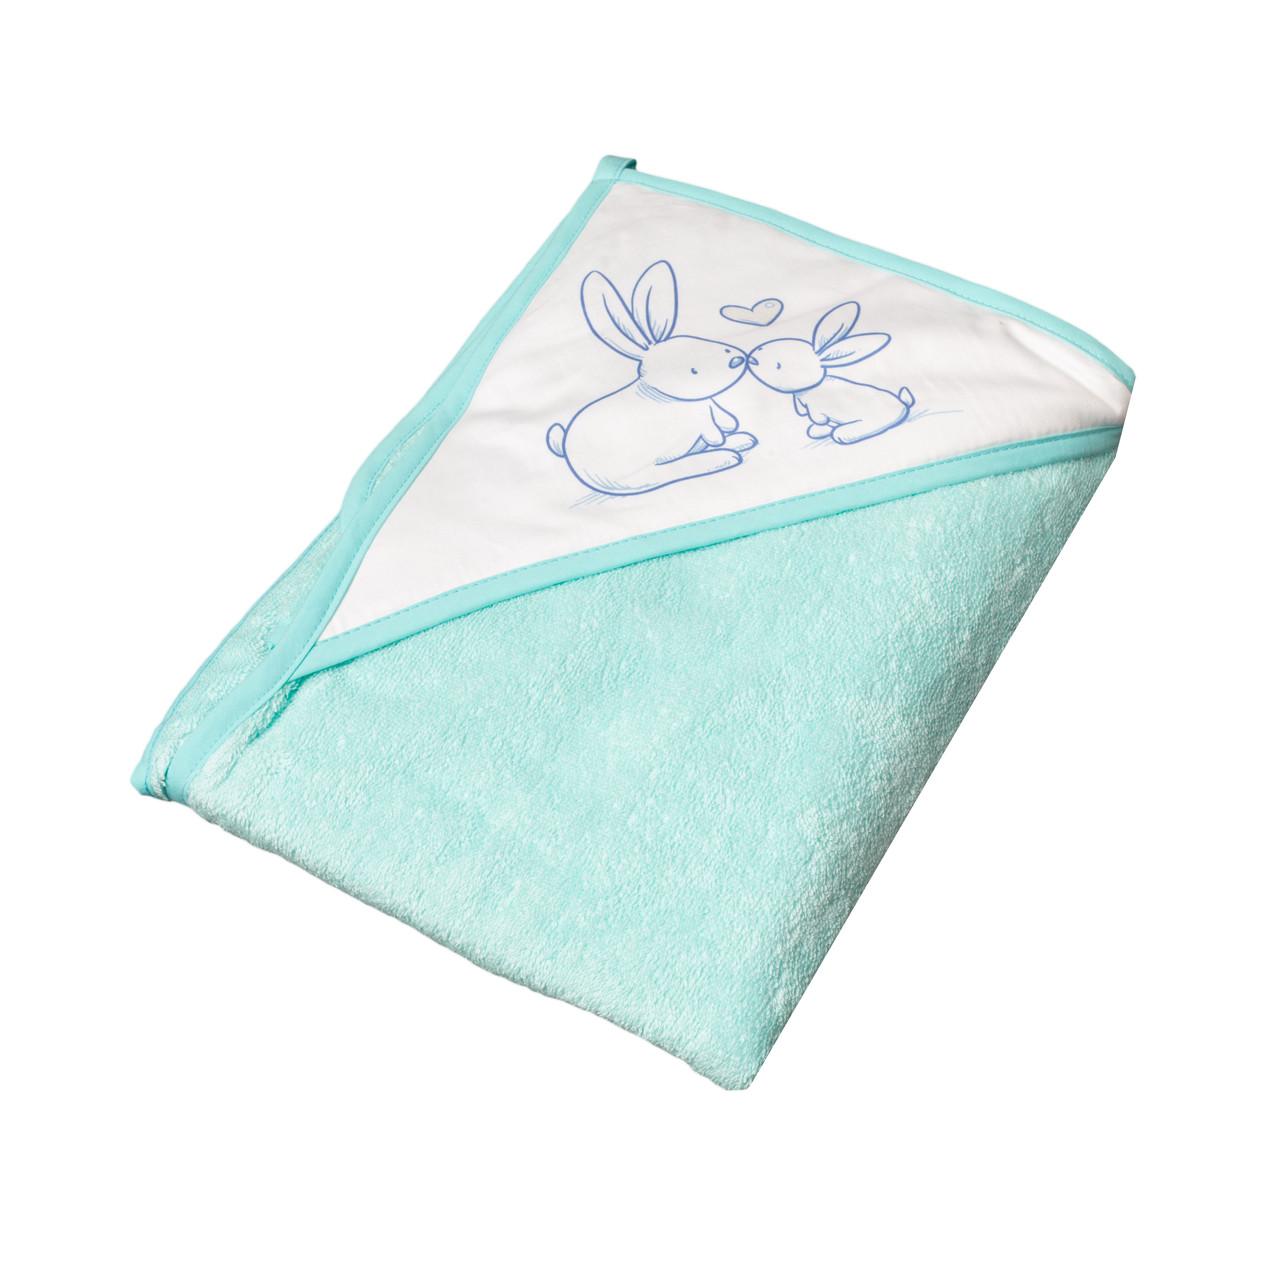 Полотенце с уголком Tega Тега Кролики 100*100, blue